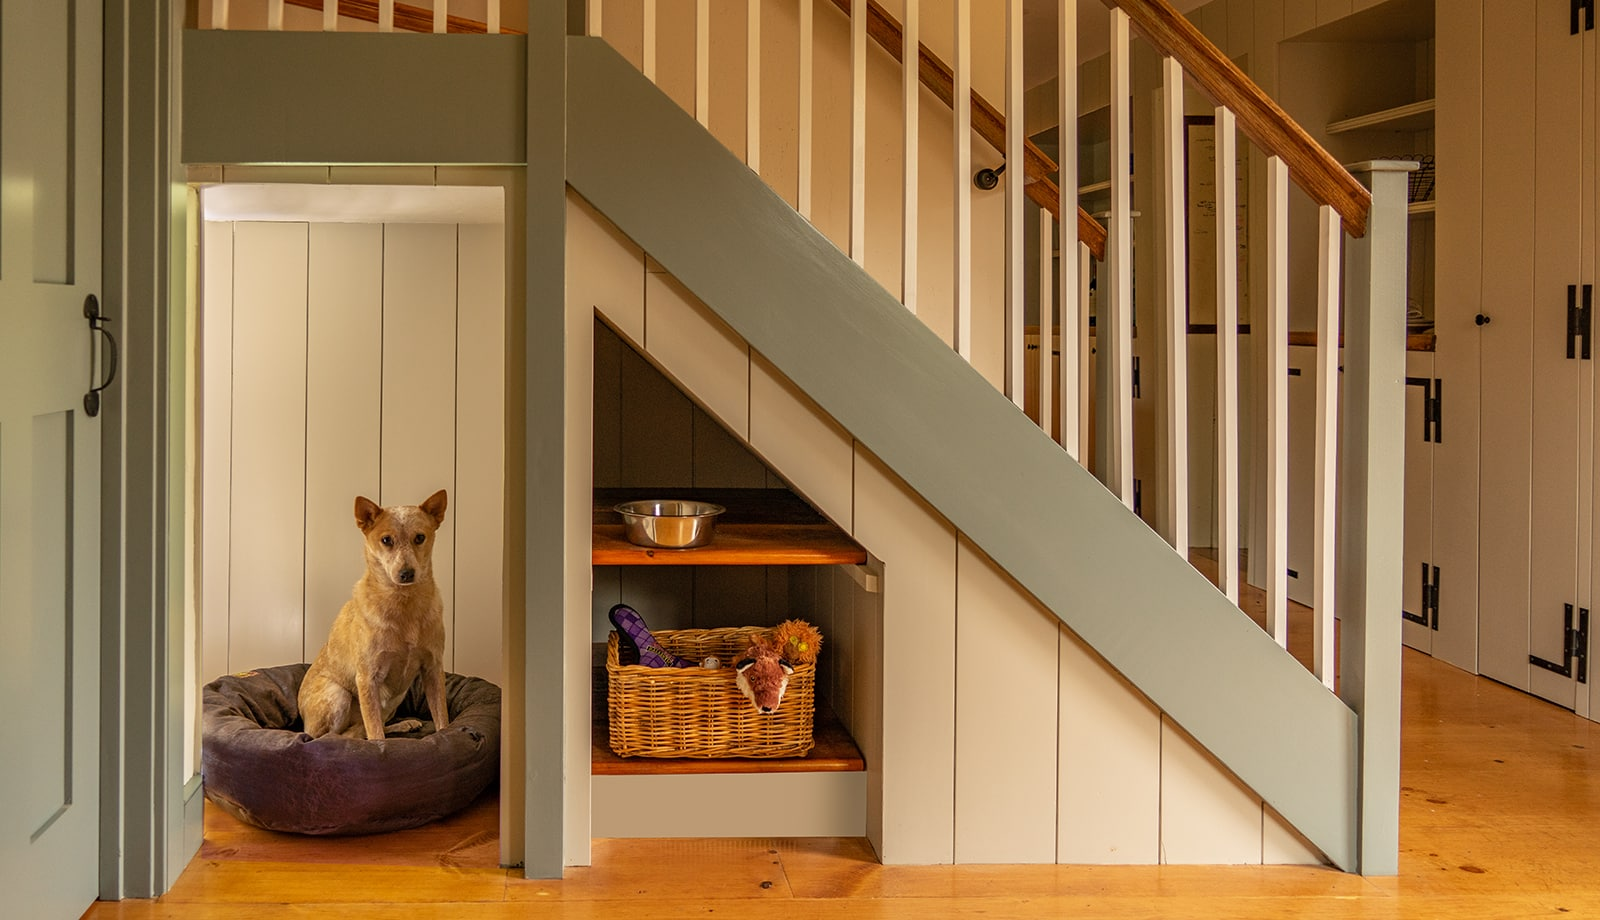 John Kimball Jr House Interiors Ipswich MA Stairs Dog featured